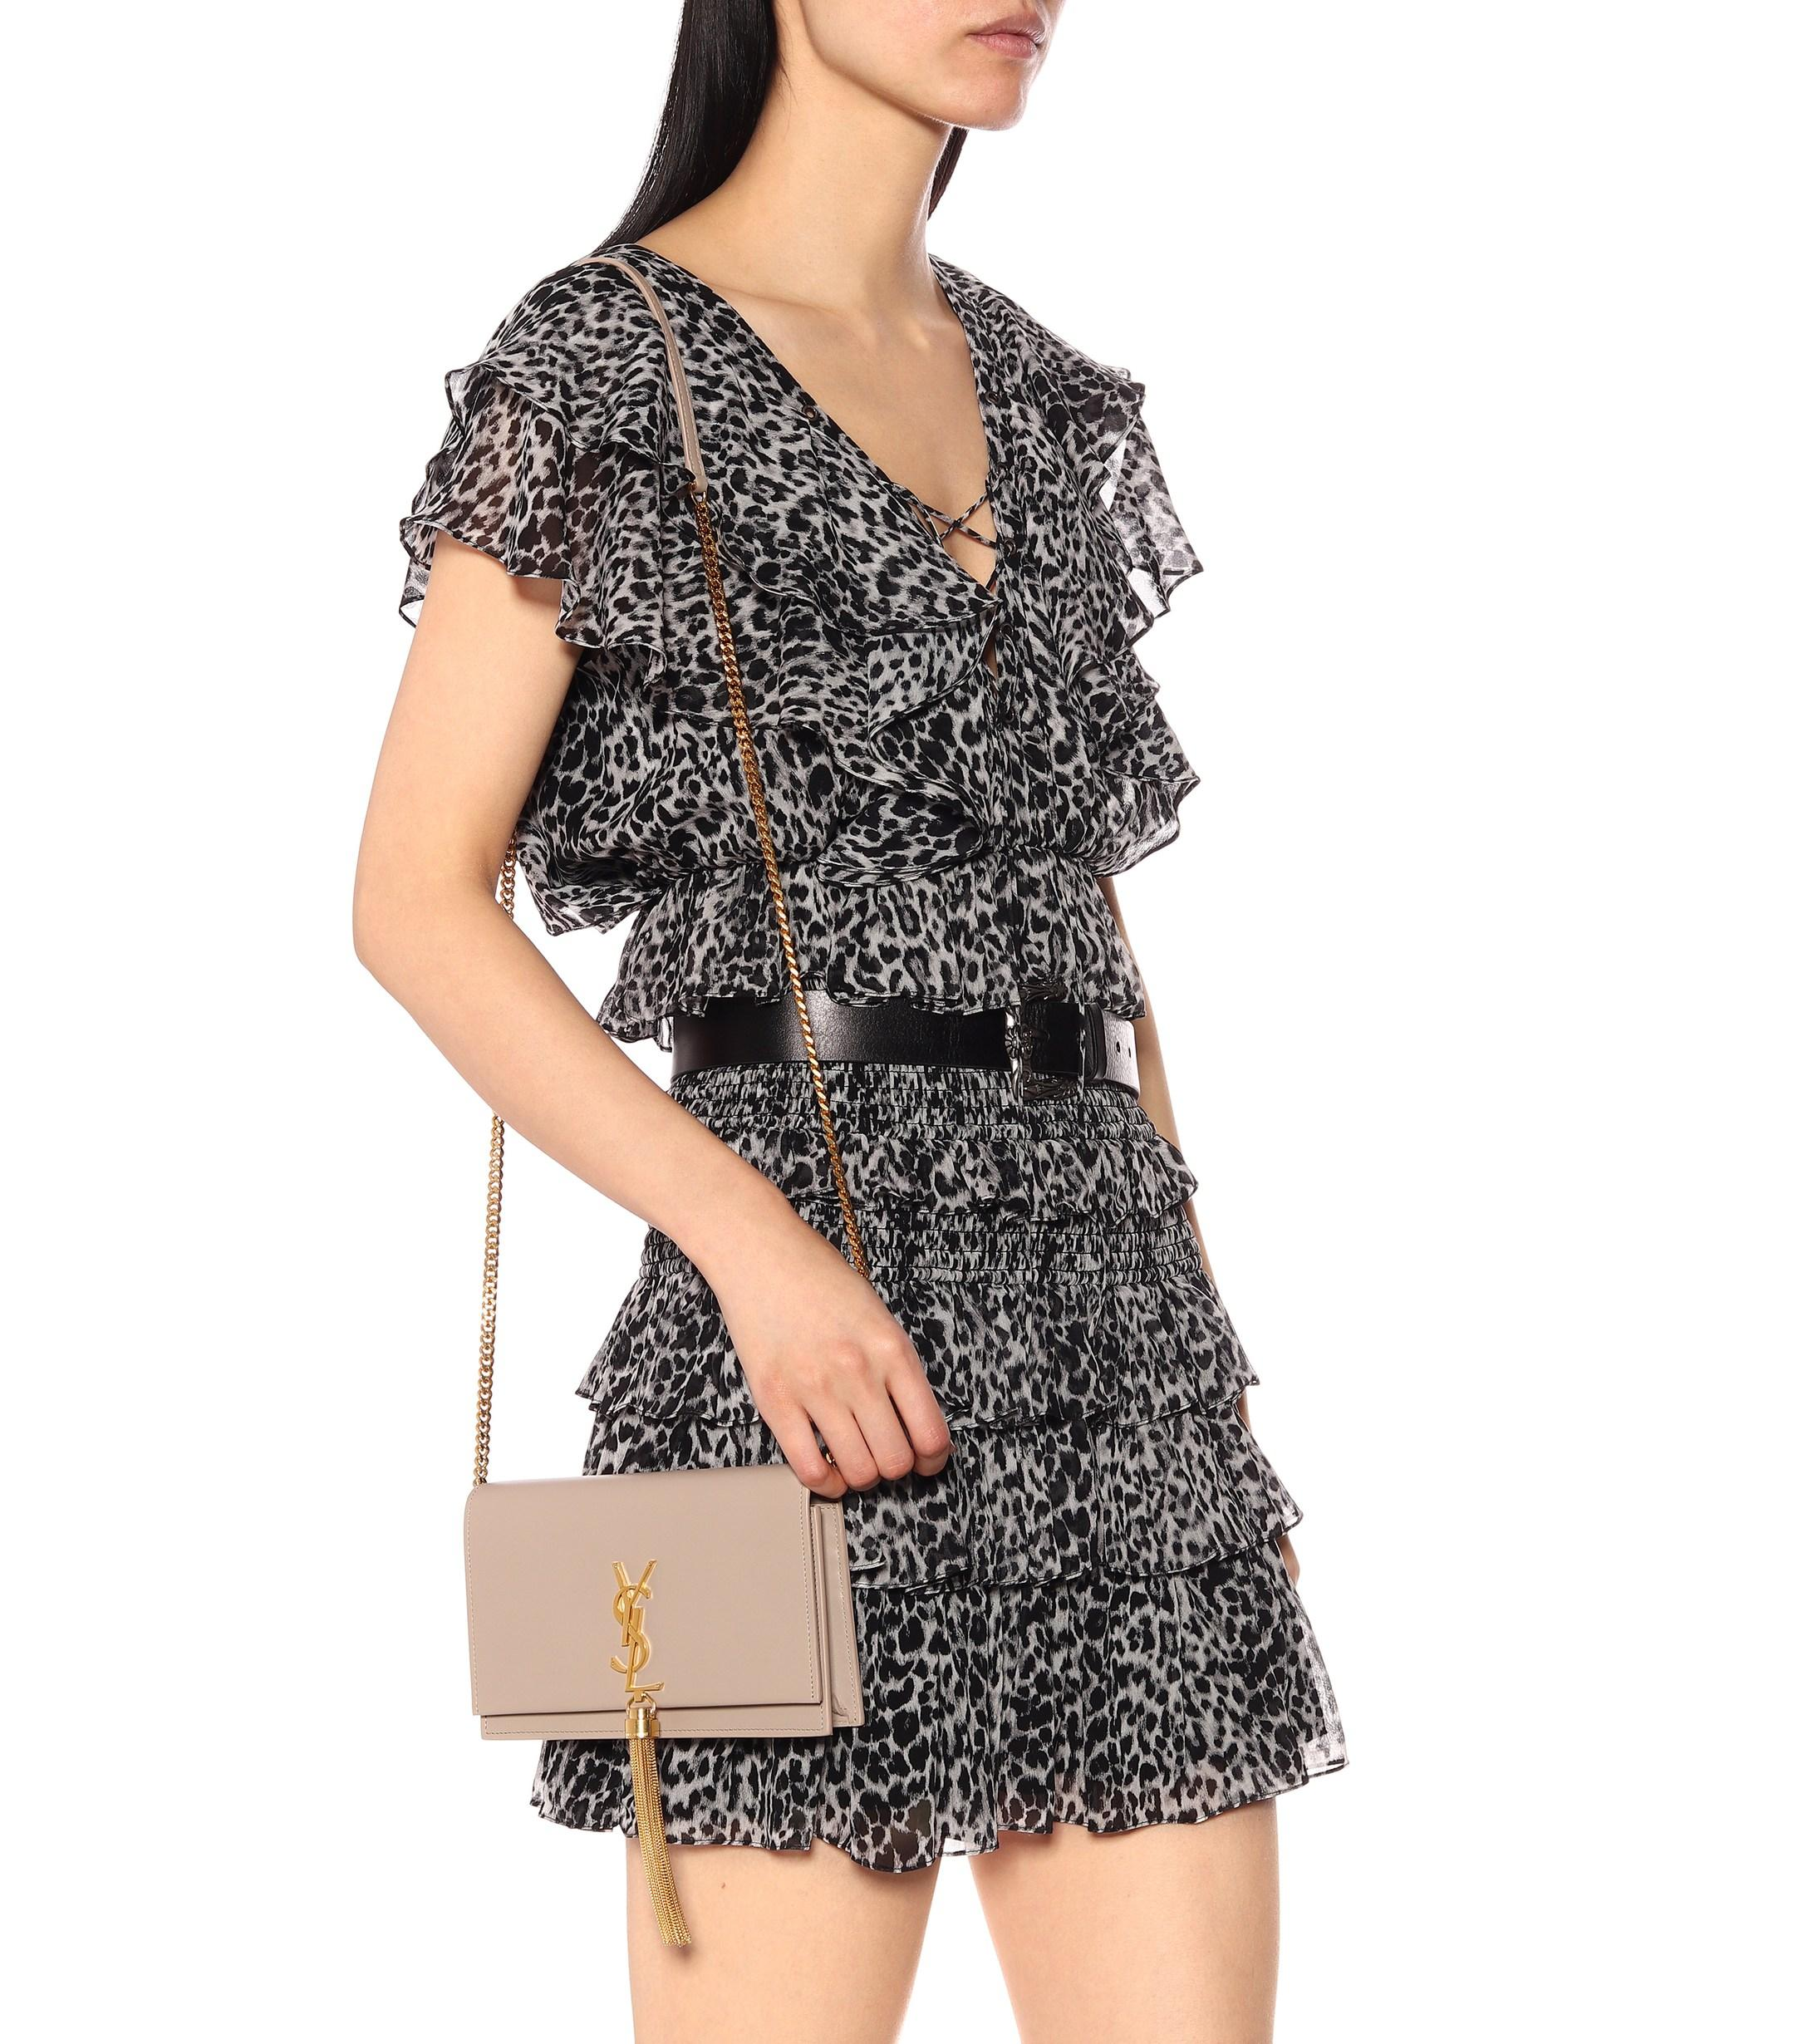 34a06dbaa9 Saint Laurent - Natural Kate Tassel Leather Shoulder Bag - Lyst. View  fullscreen